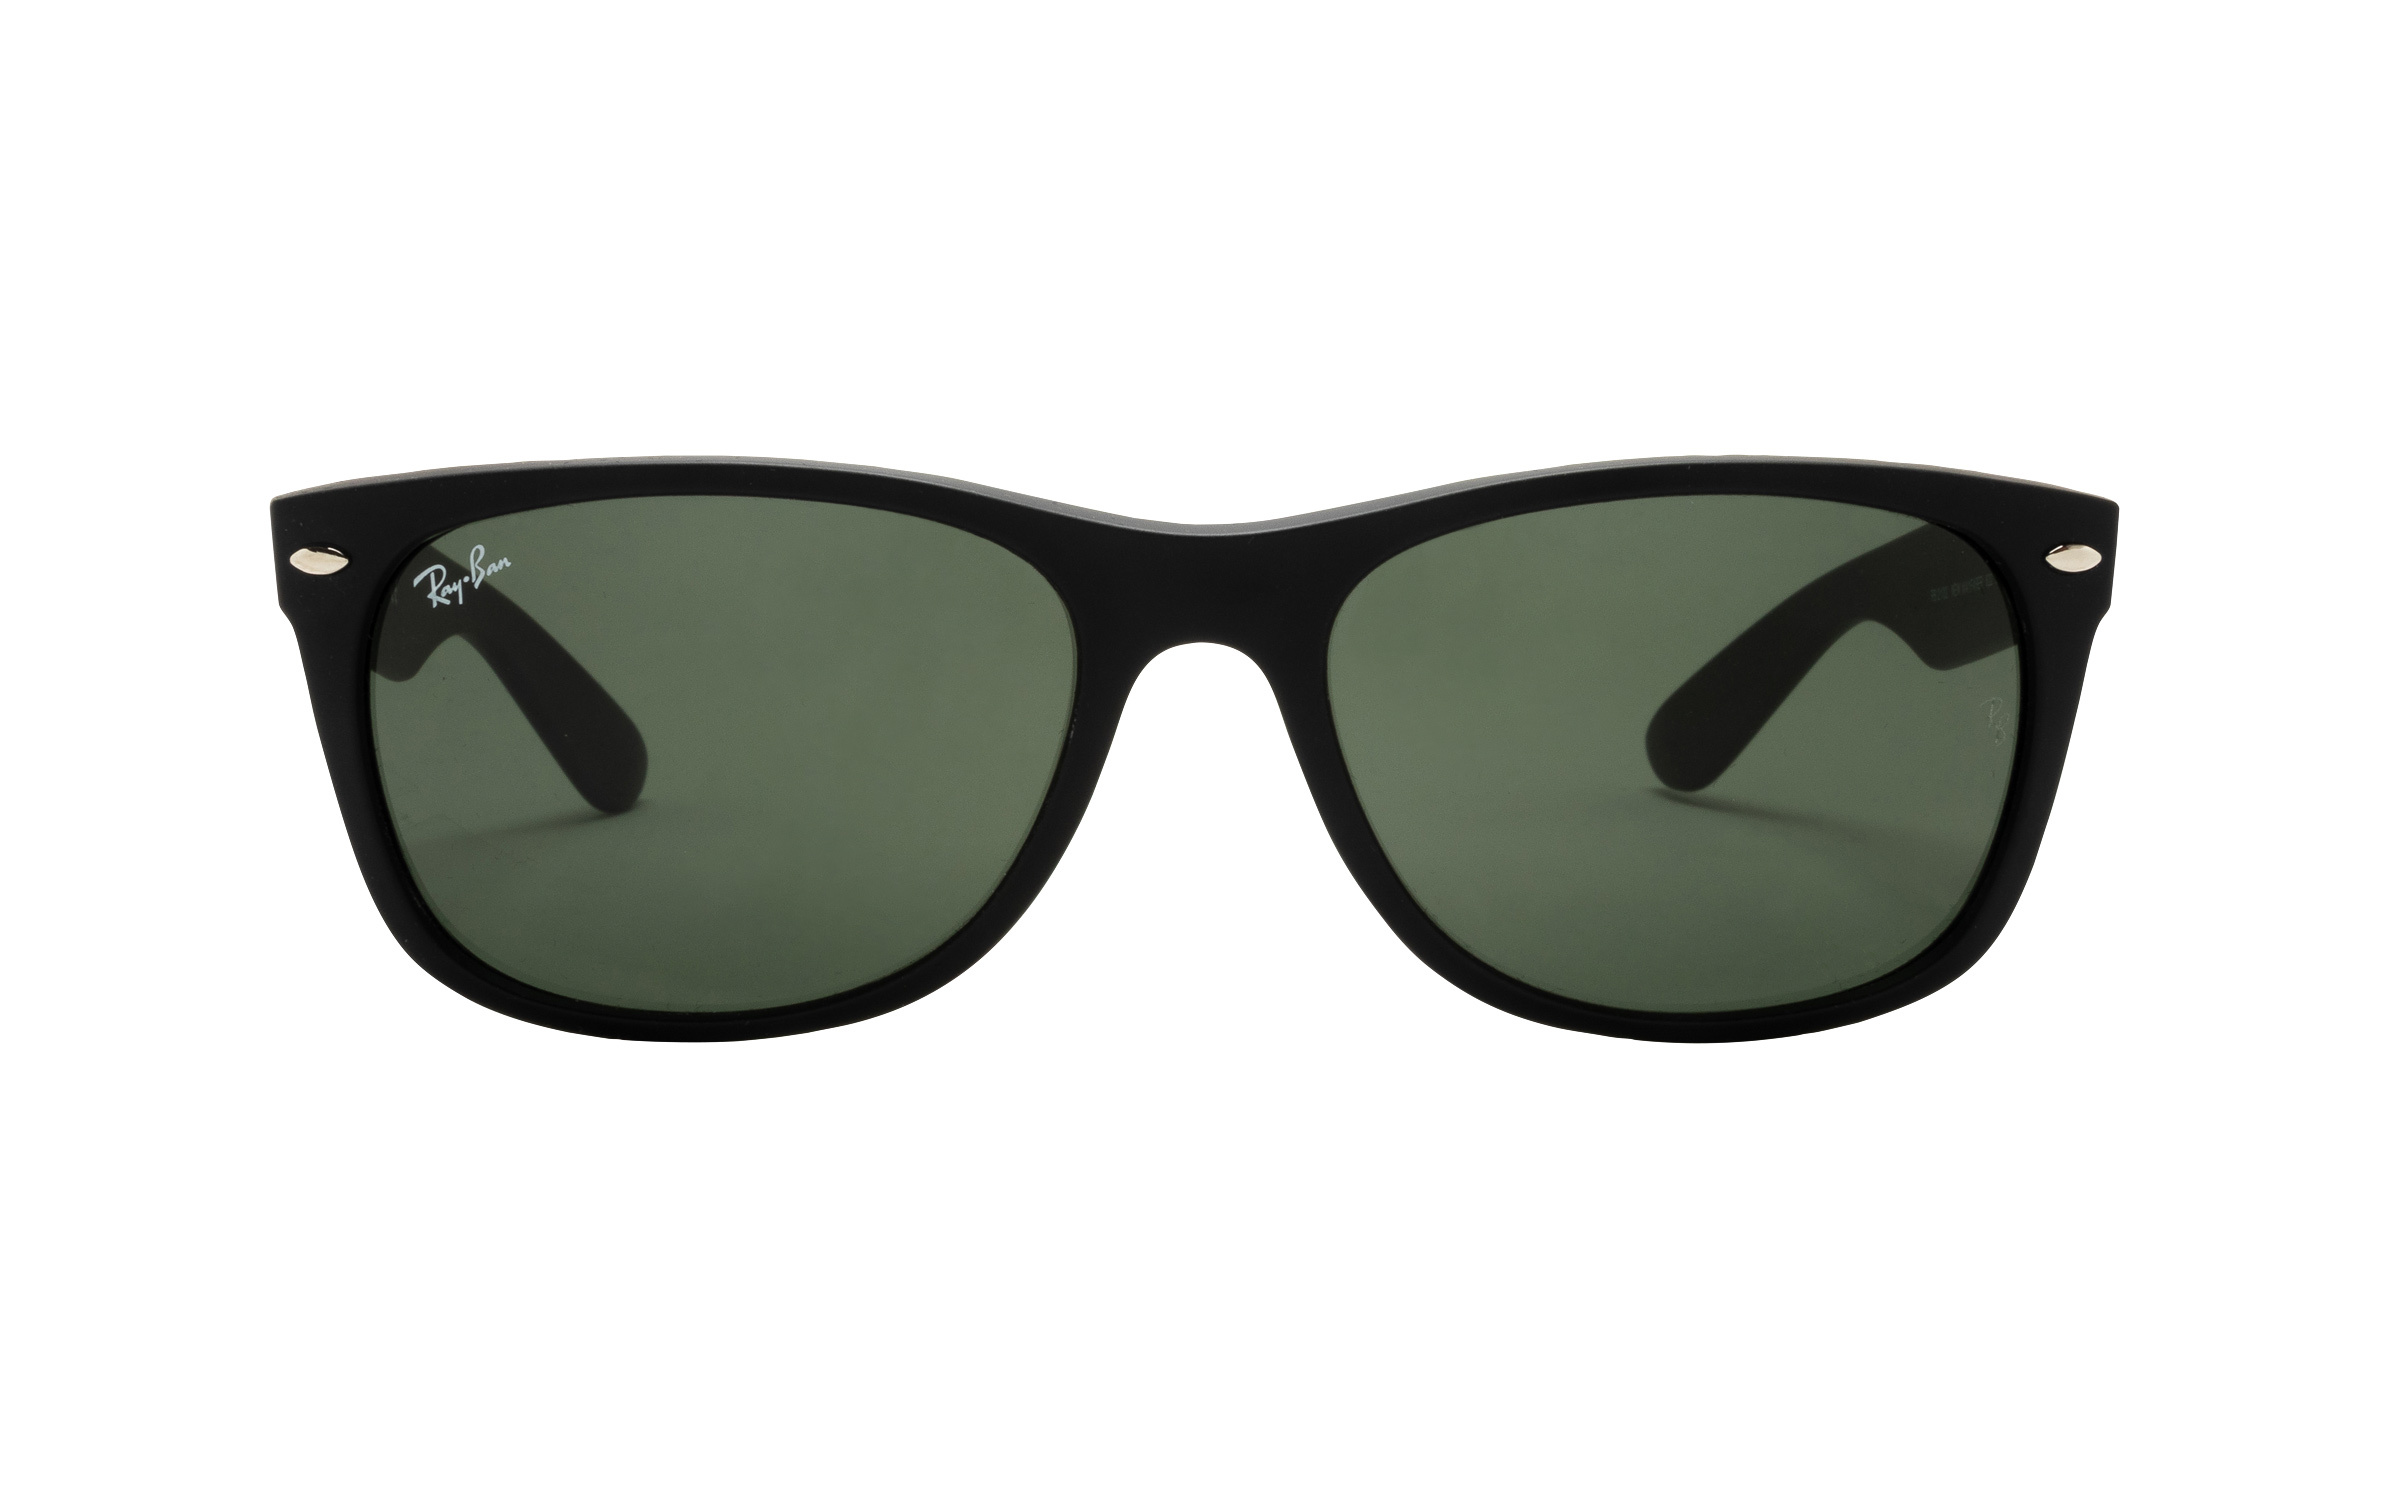 coastal.com - RayBan Ray-Ban RB2132 622 Rubber 58 Sunglasses in Black – Online Coastal 144.00 USD